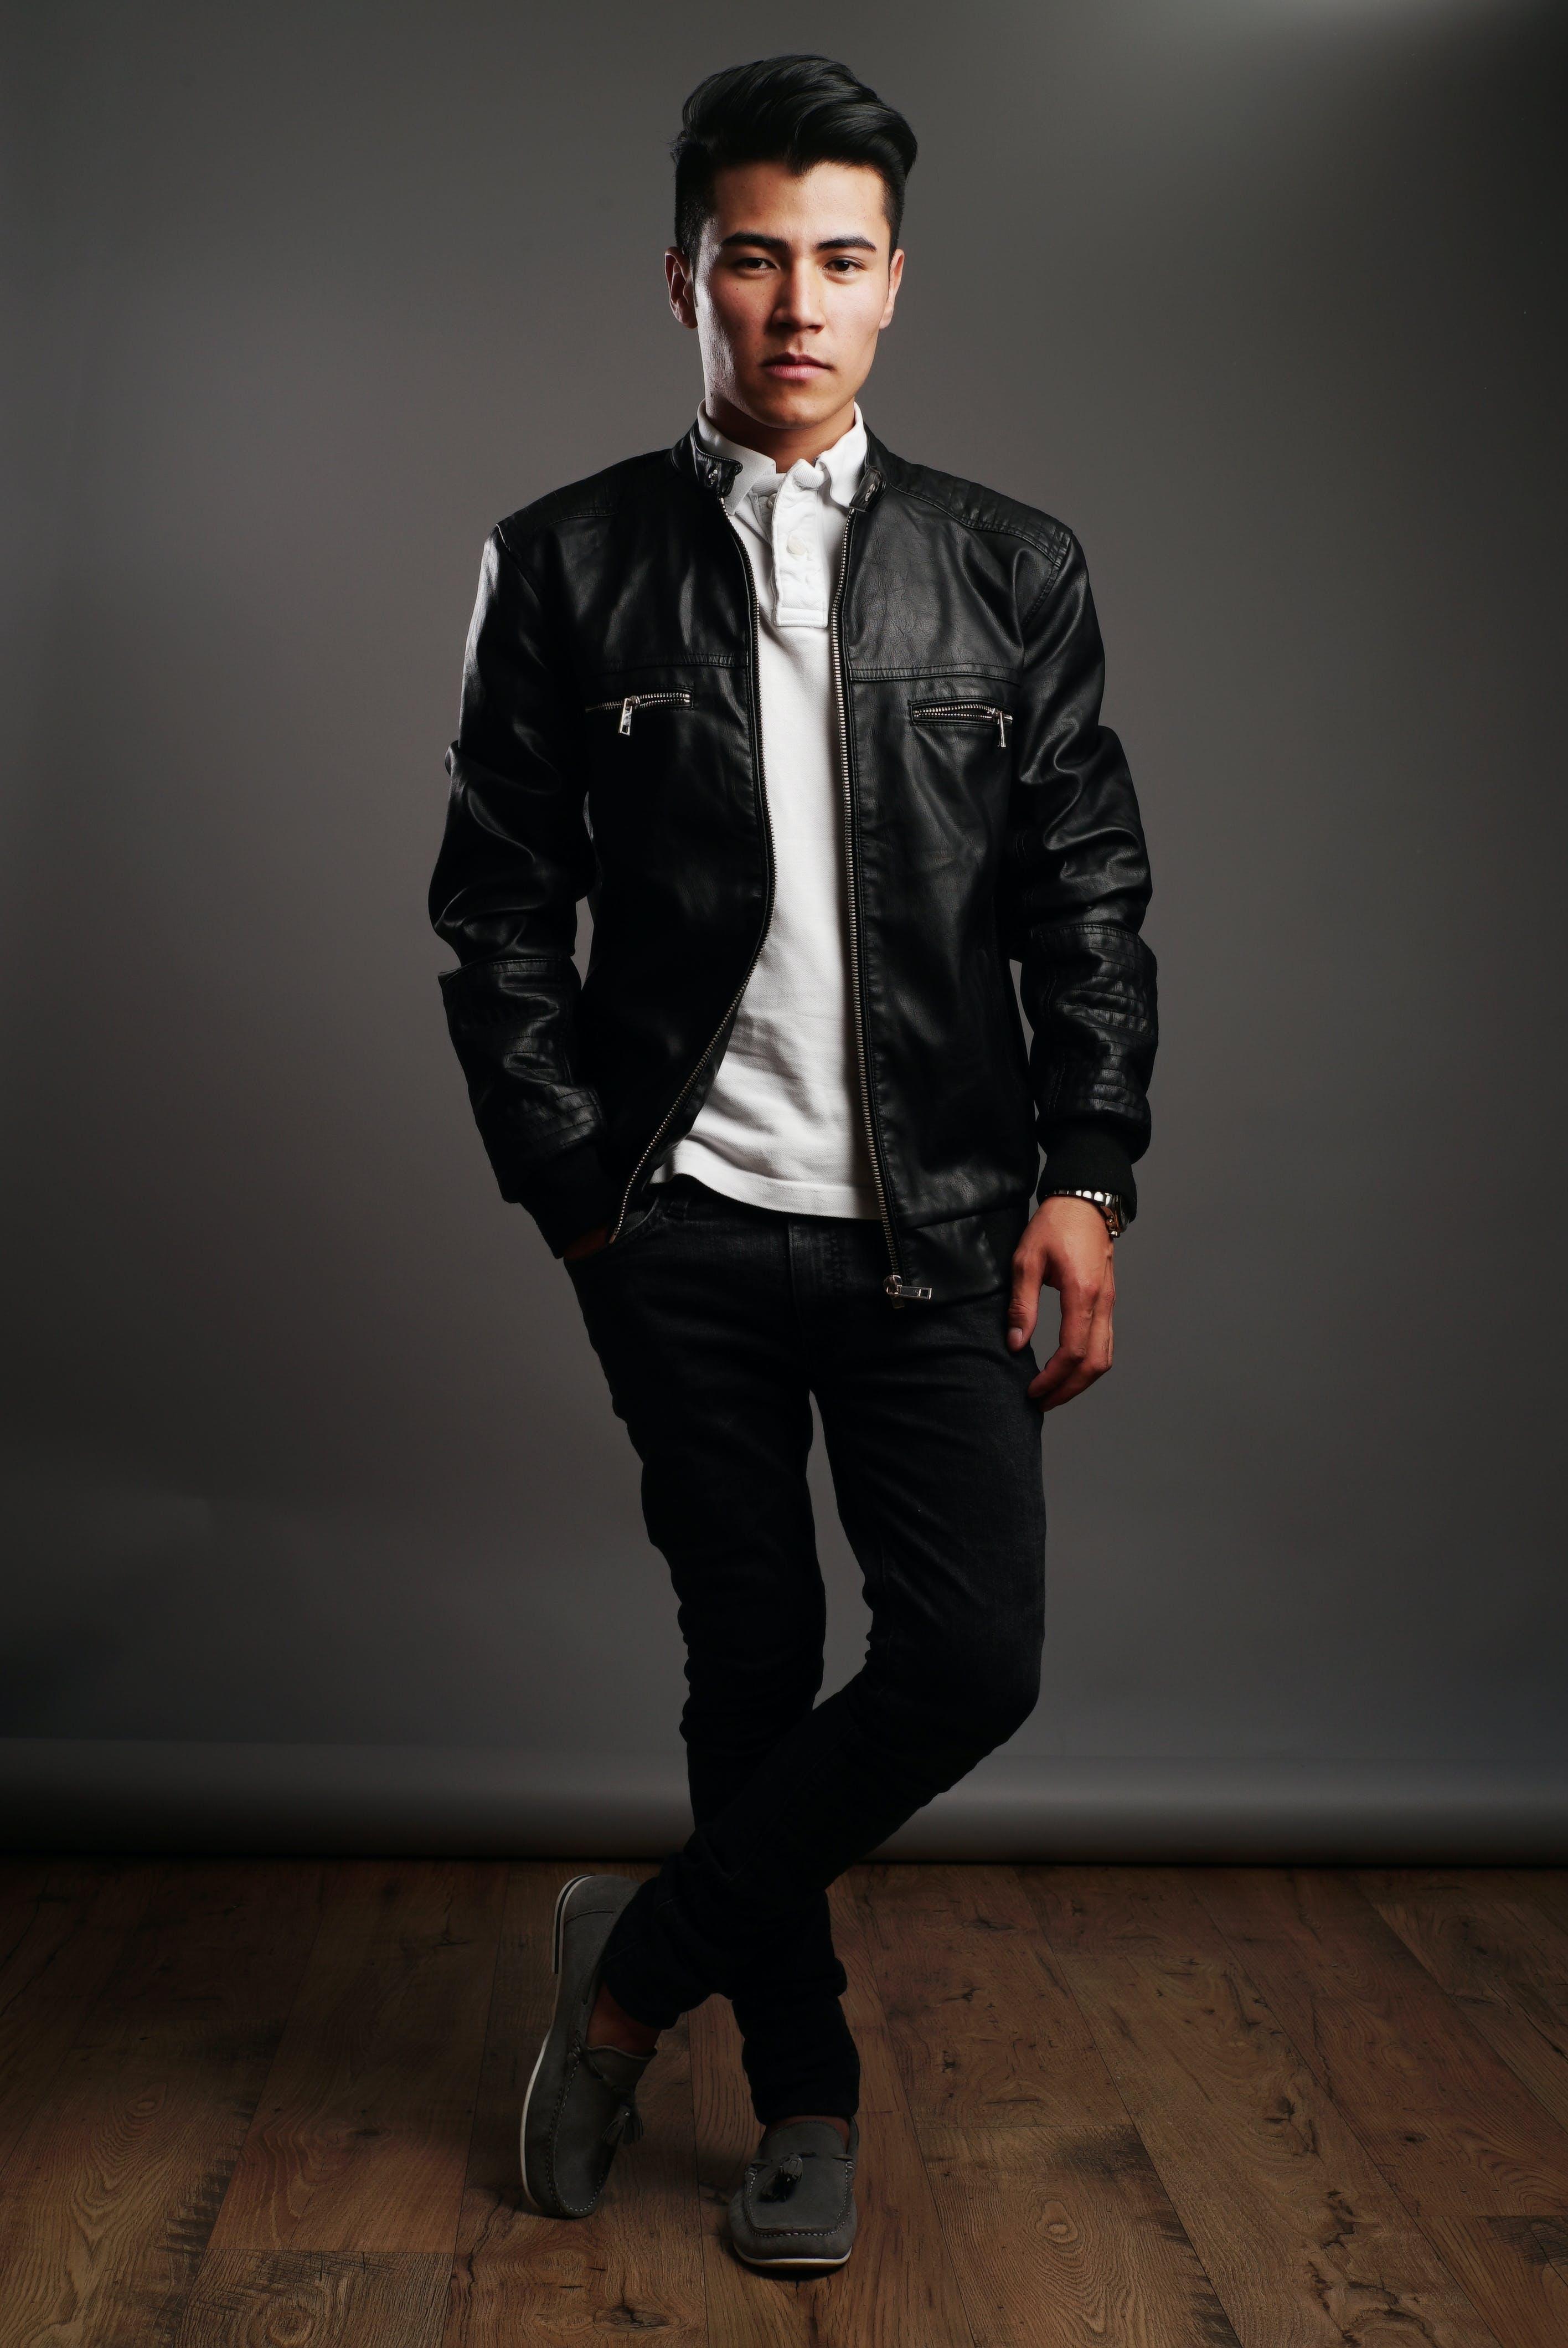 Free stock photo of adult, black leather jacket, contemporary, fashion